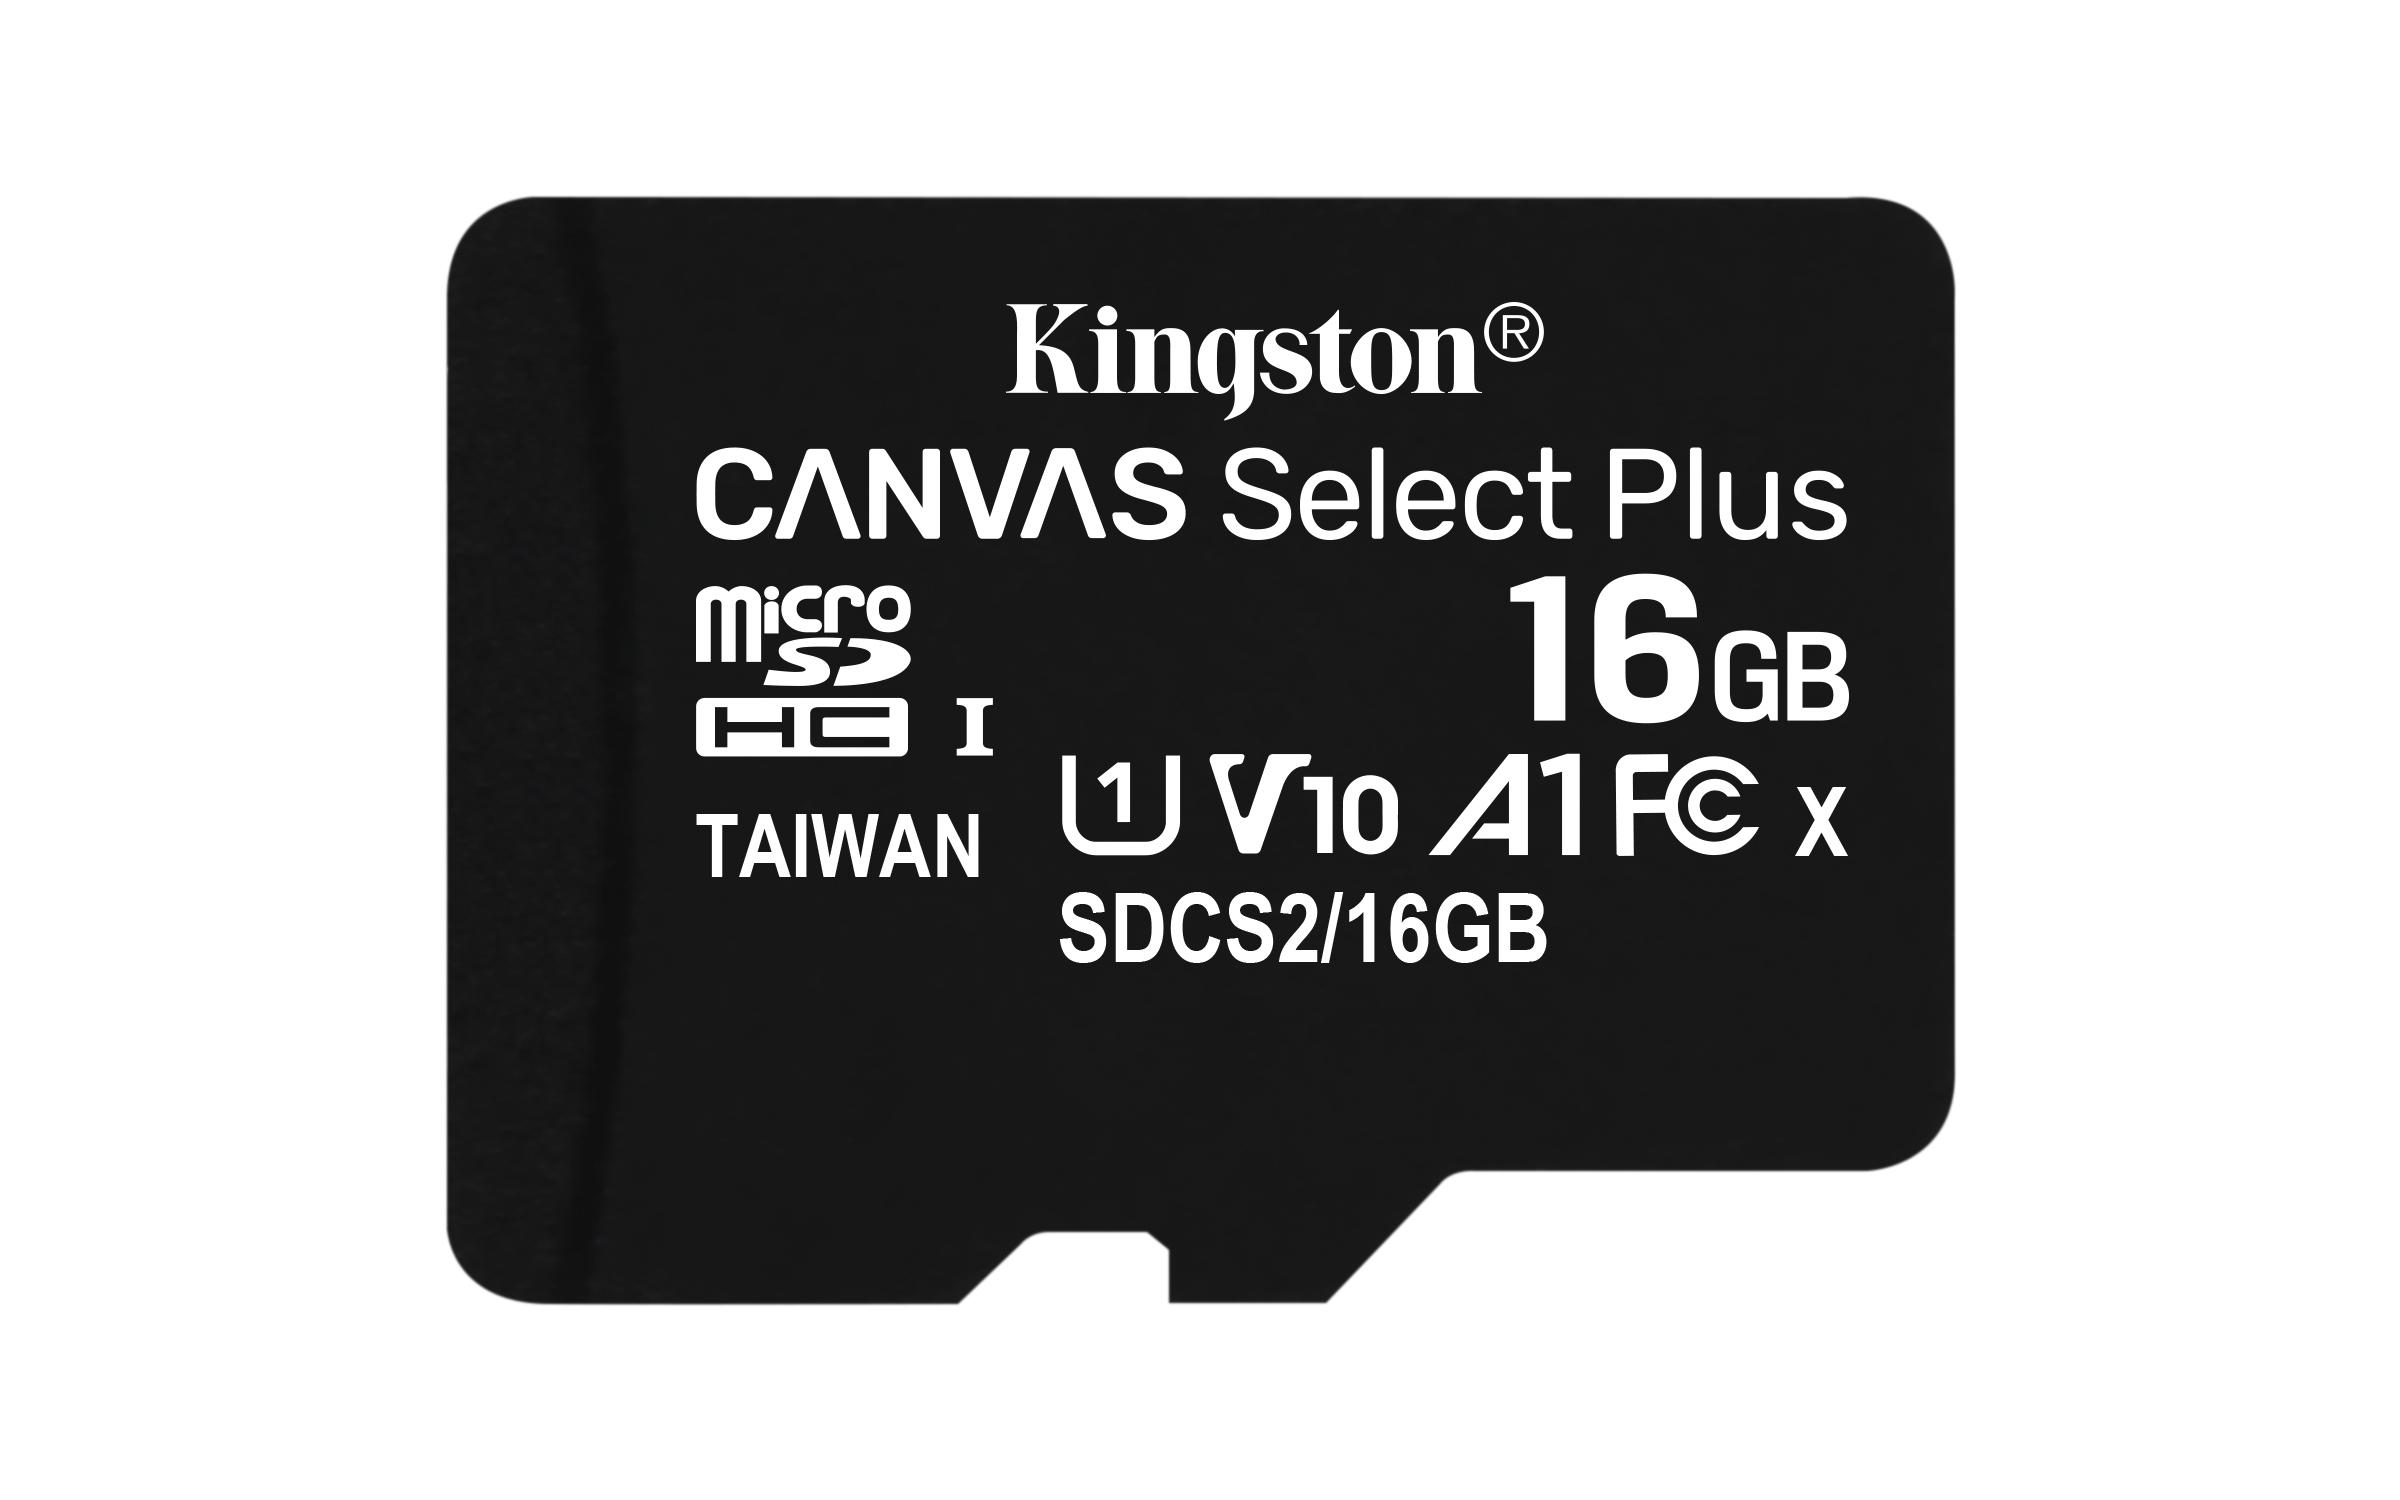 CANVAS SELECT PLUS MEMORIA FLASH 16 GB MICROSDHC CLASE 10 UHS-I